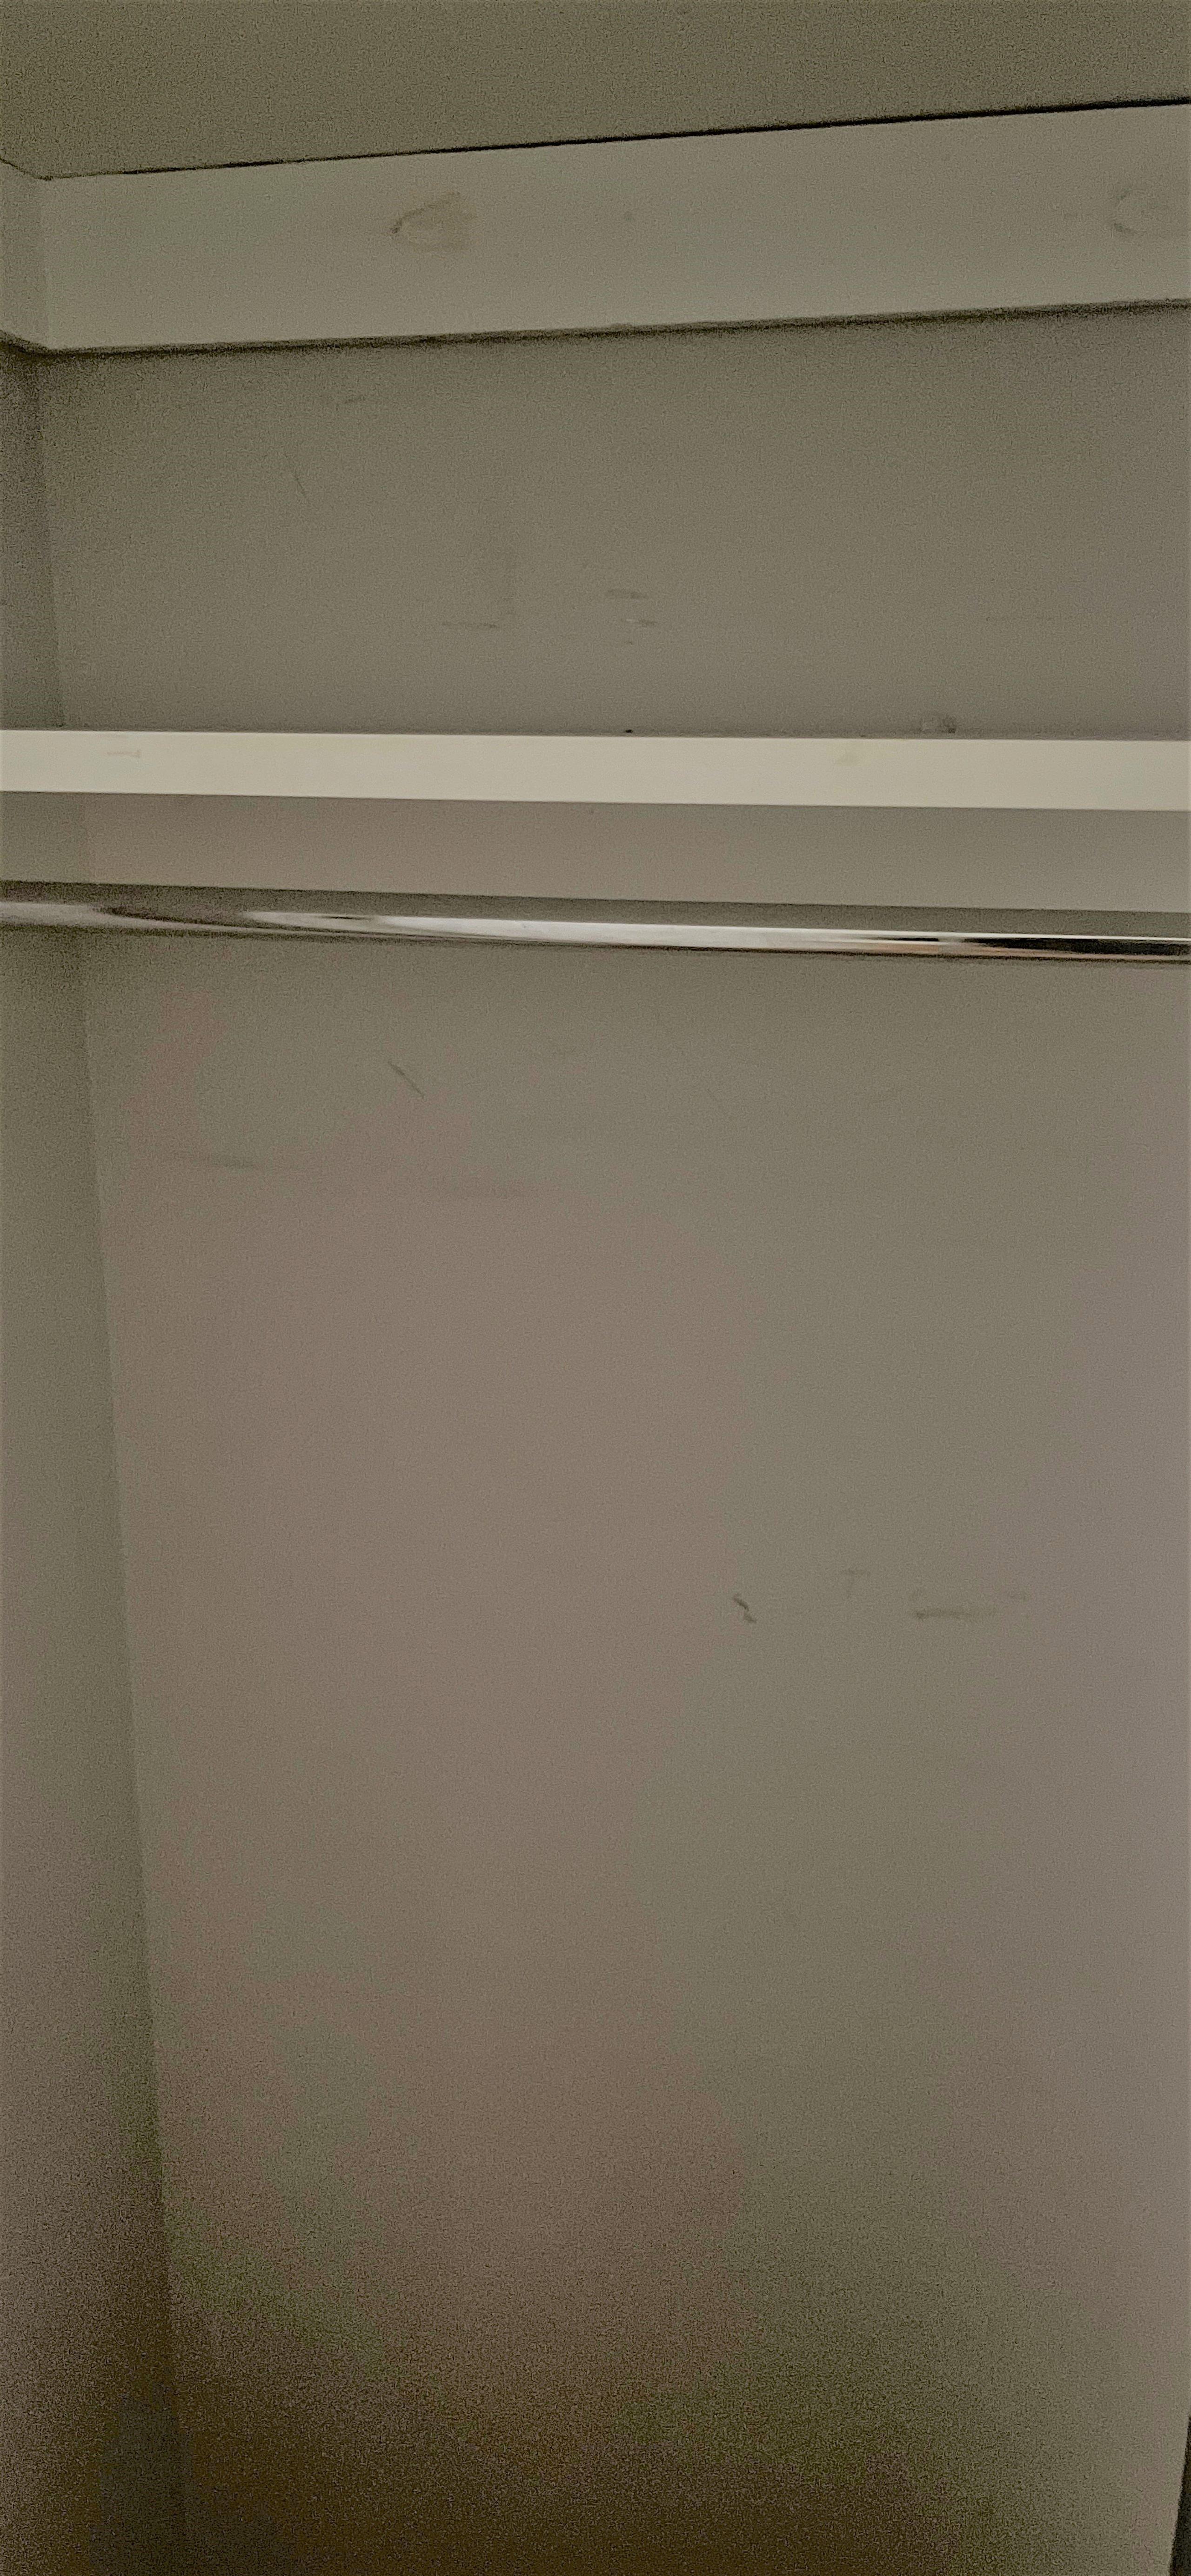 8x2 Closet self storage unit